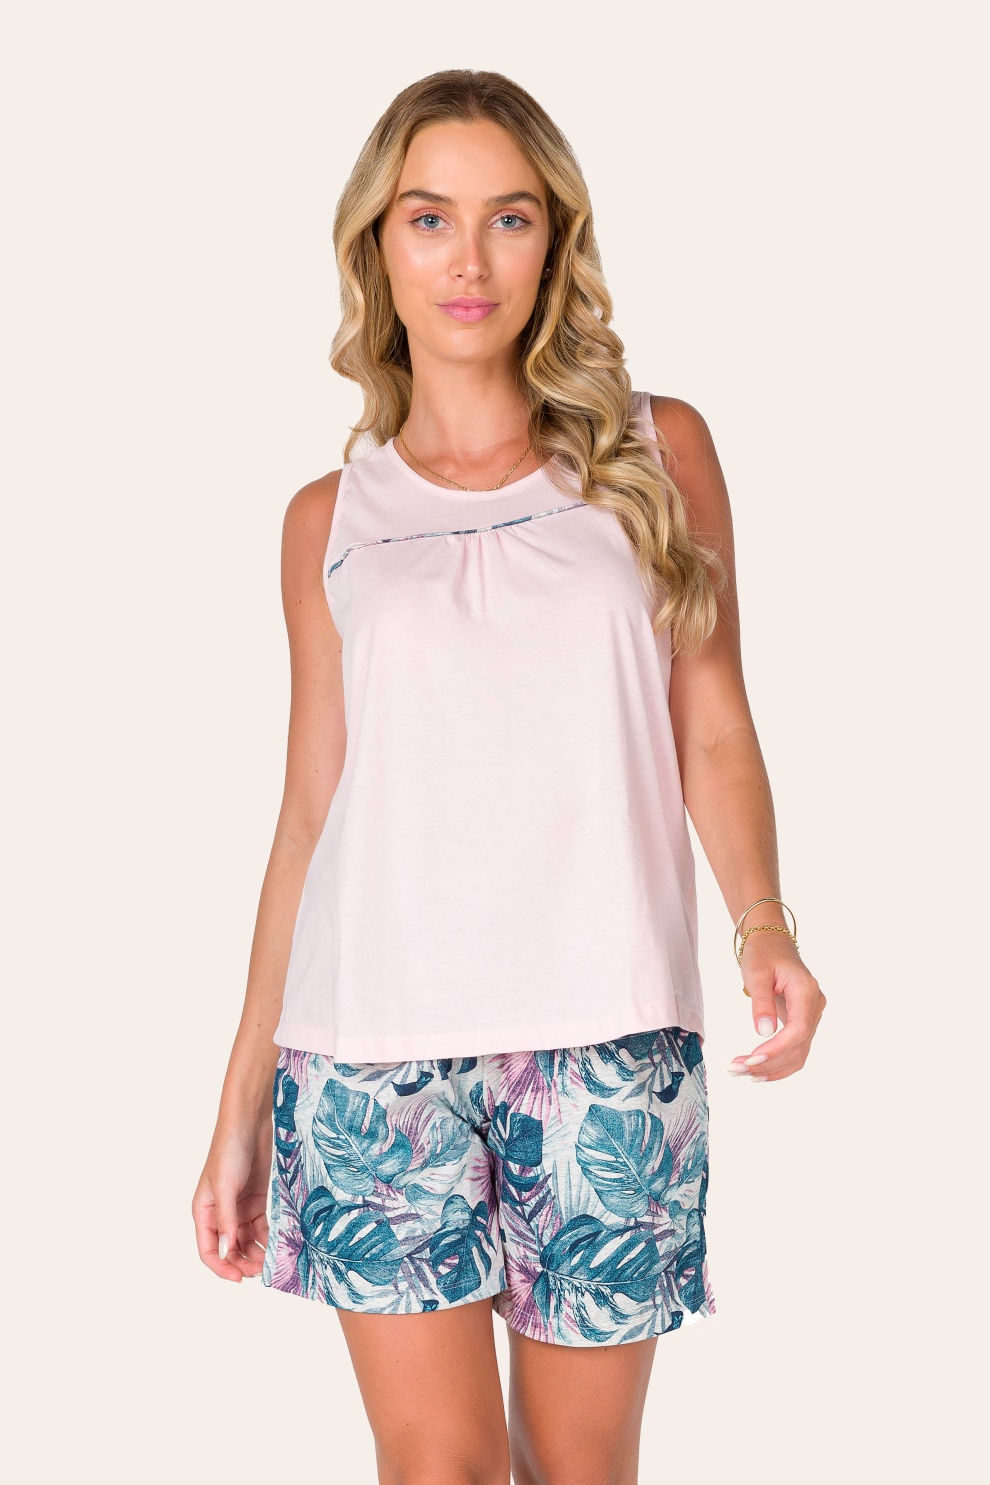 031/A - Pijama Curto Adulto Feminino Regata